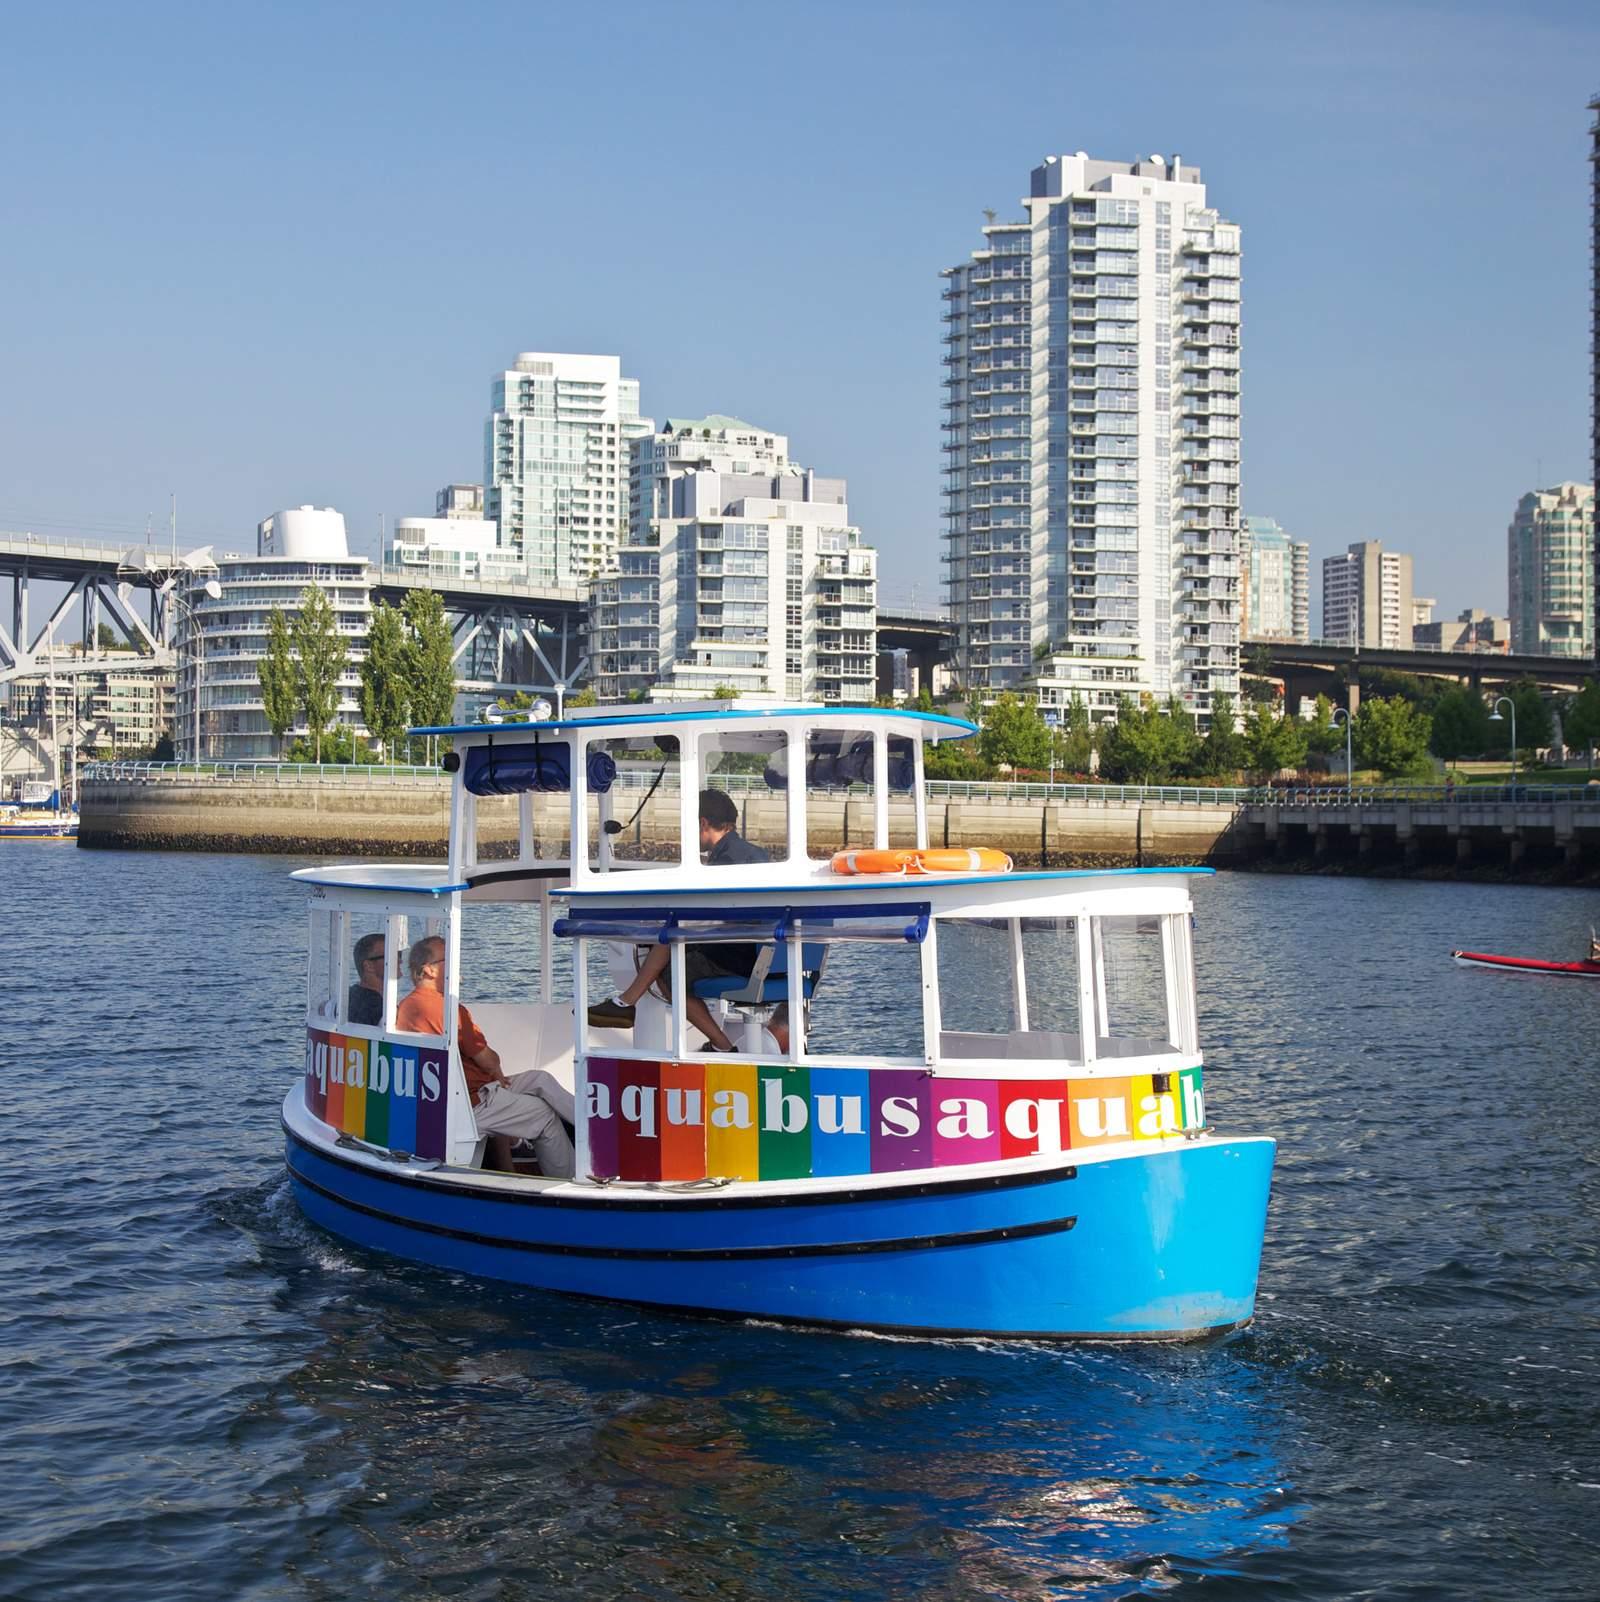 Aqua Bus bei False Creek in Vancouver, British Columbia